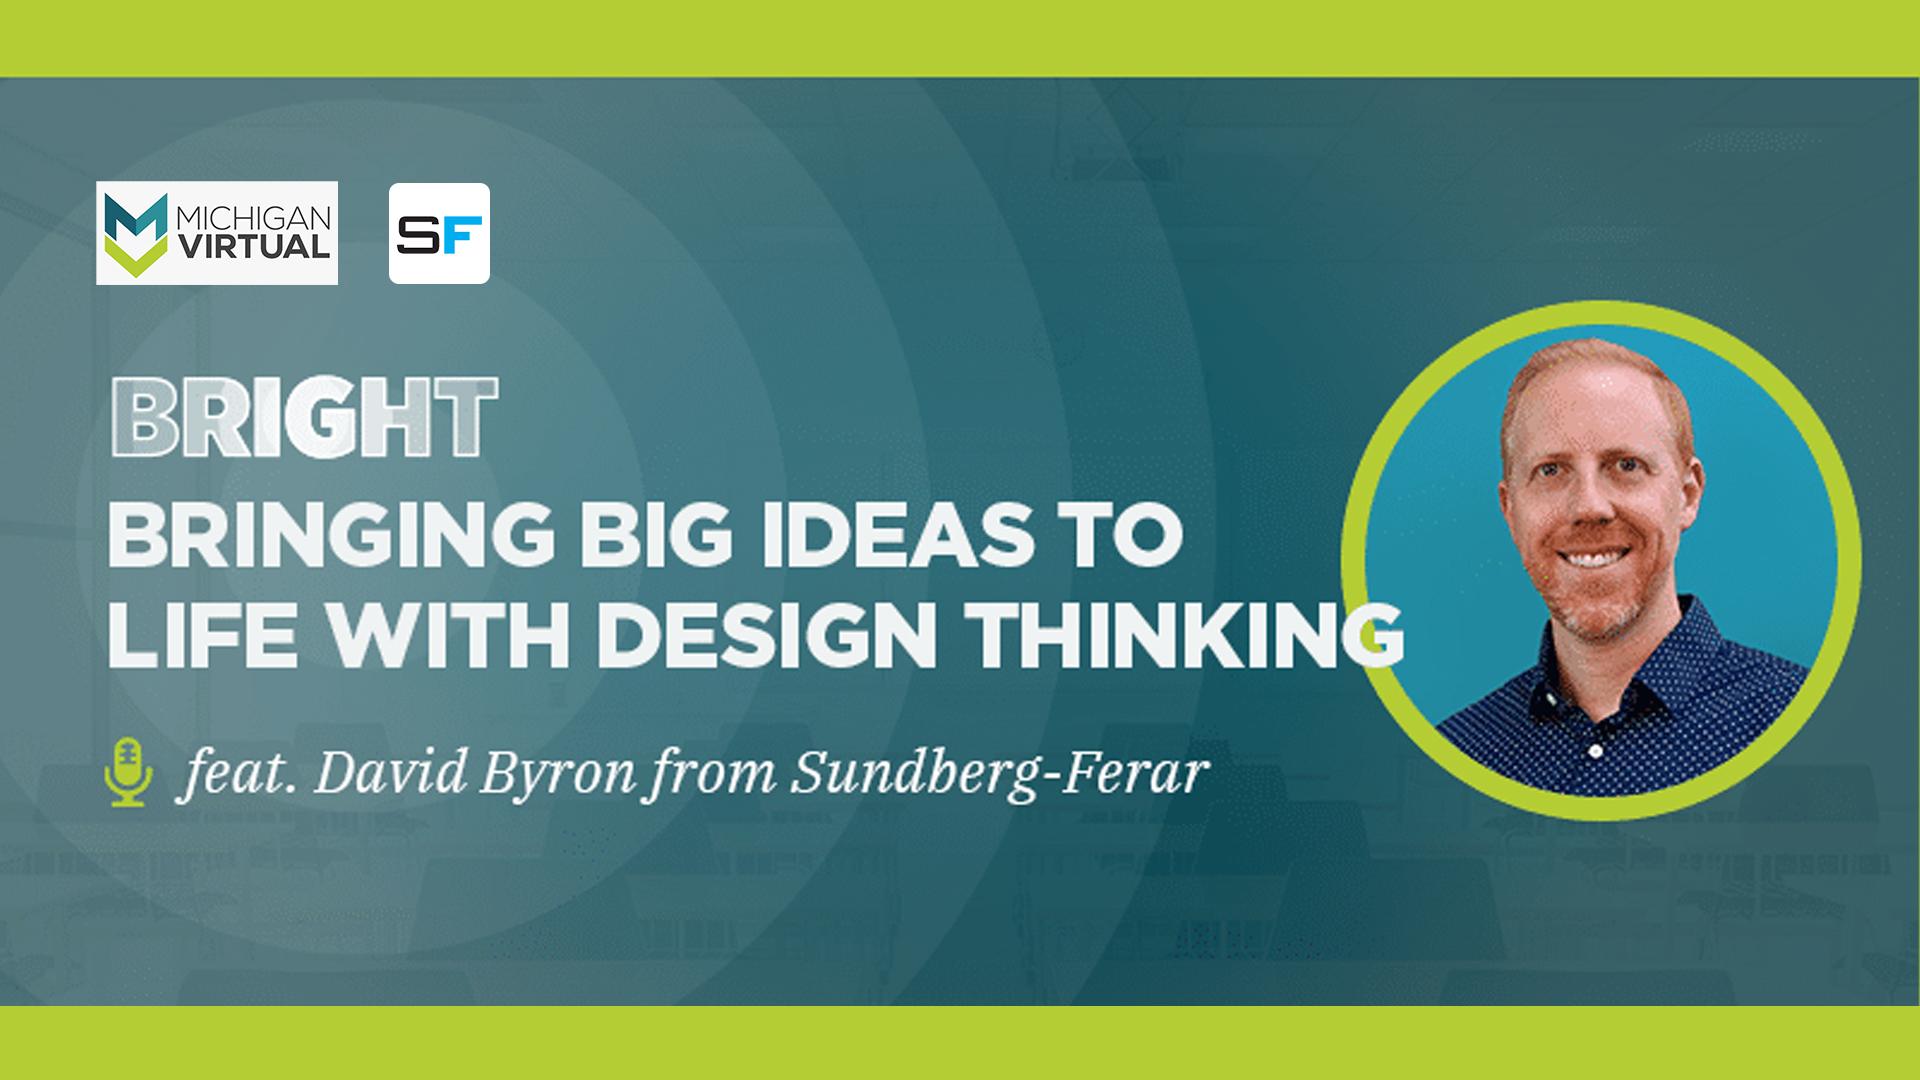 Bringing Big Ideas to Life with Design Thinking